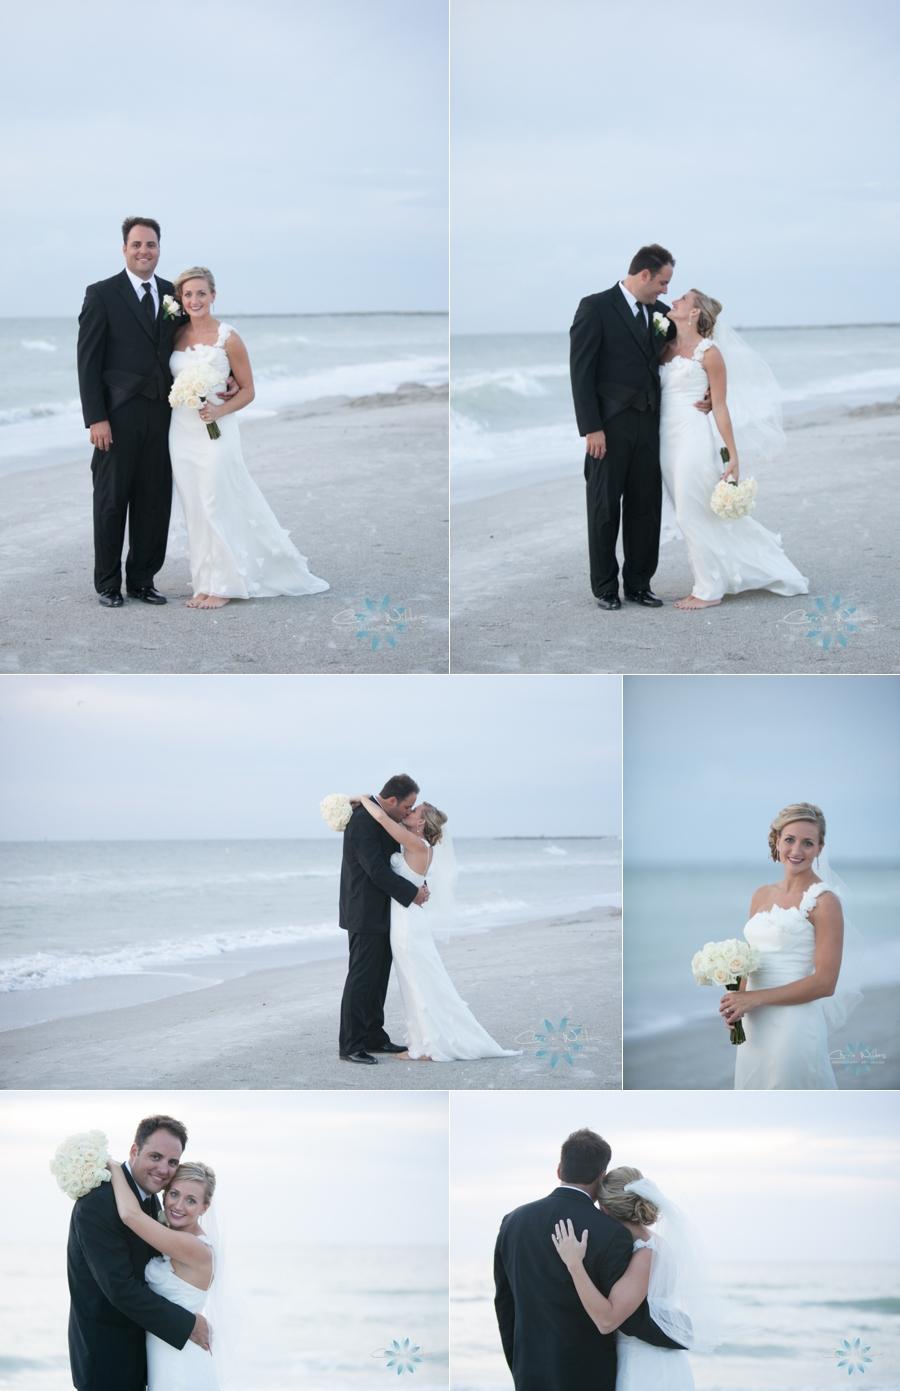 11_1_13 Clearwater Sailing Center Wedding_0008.jpg